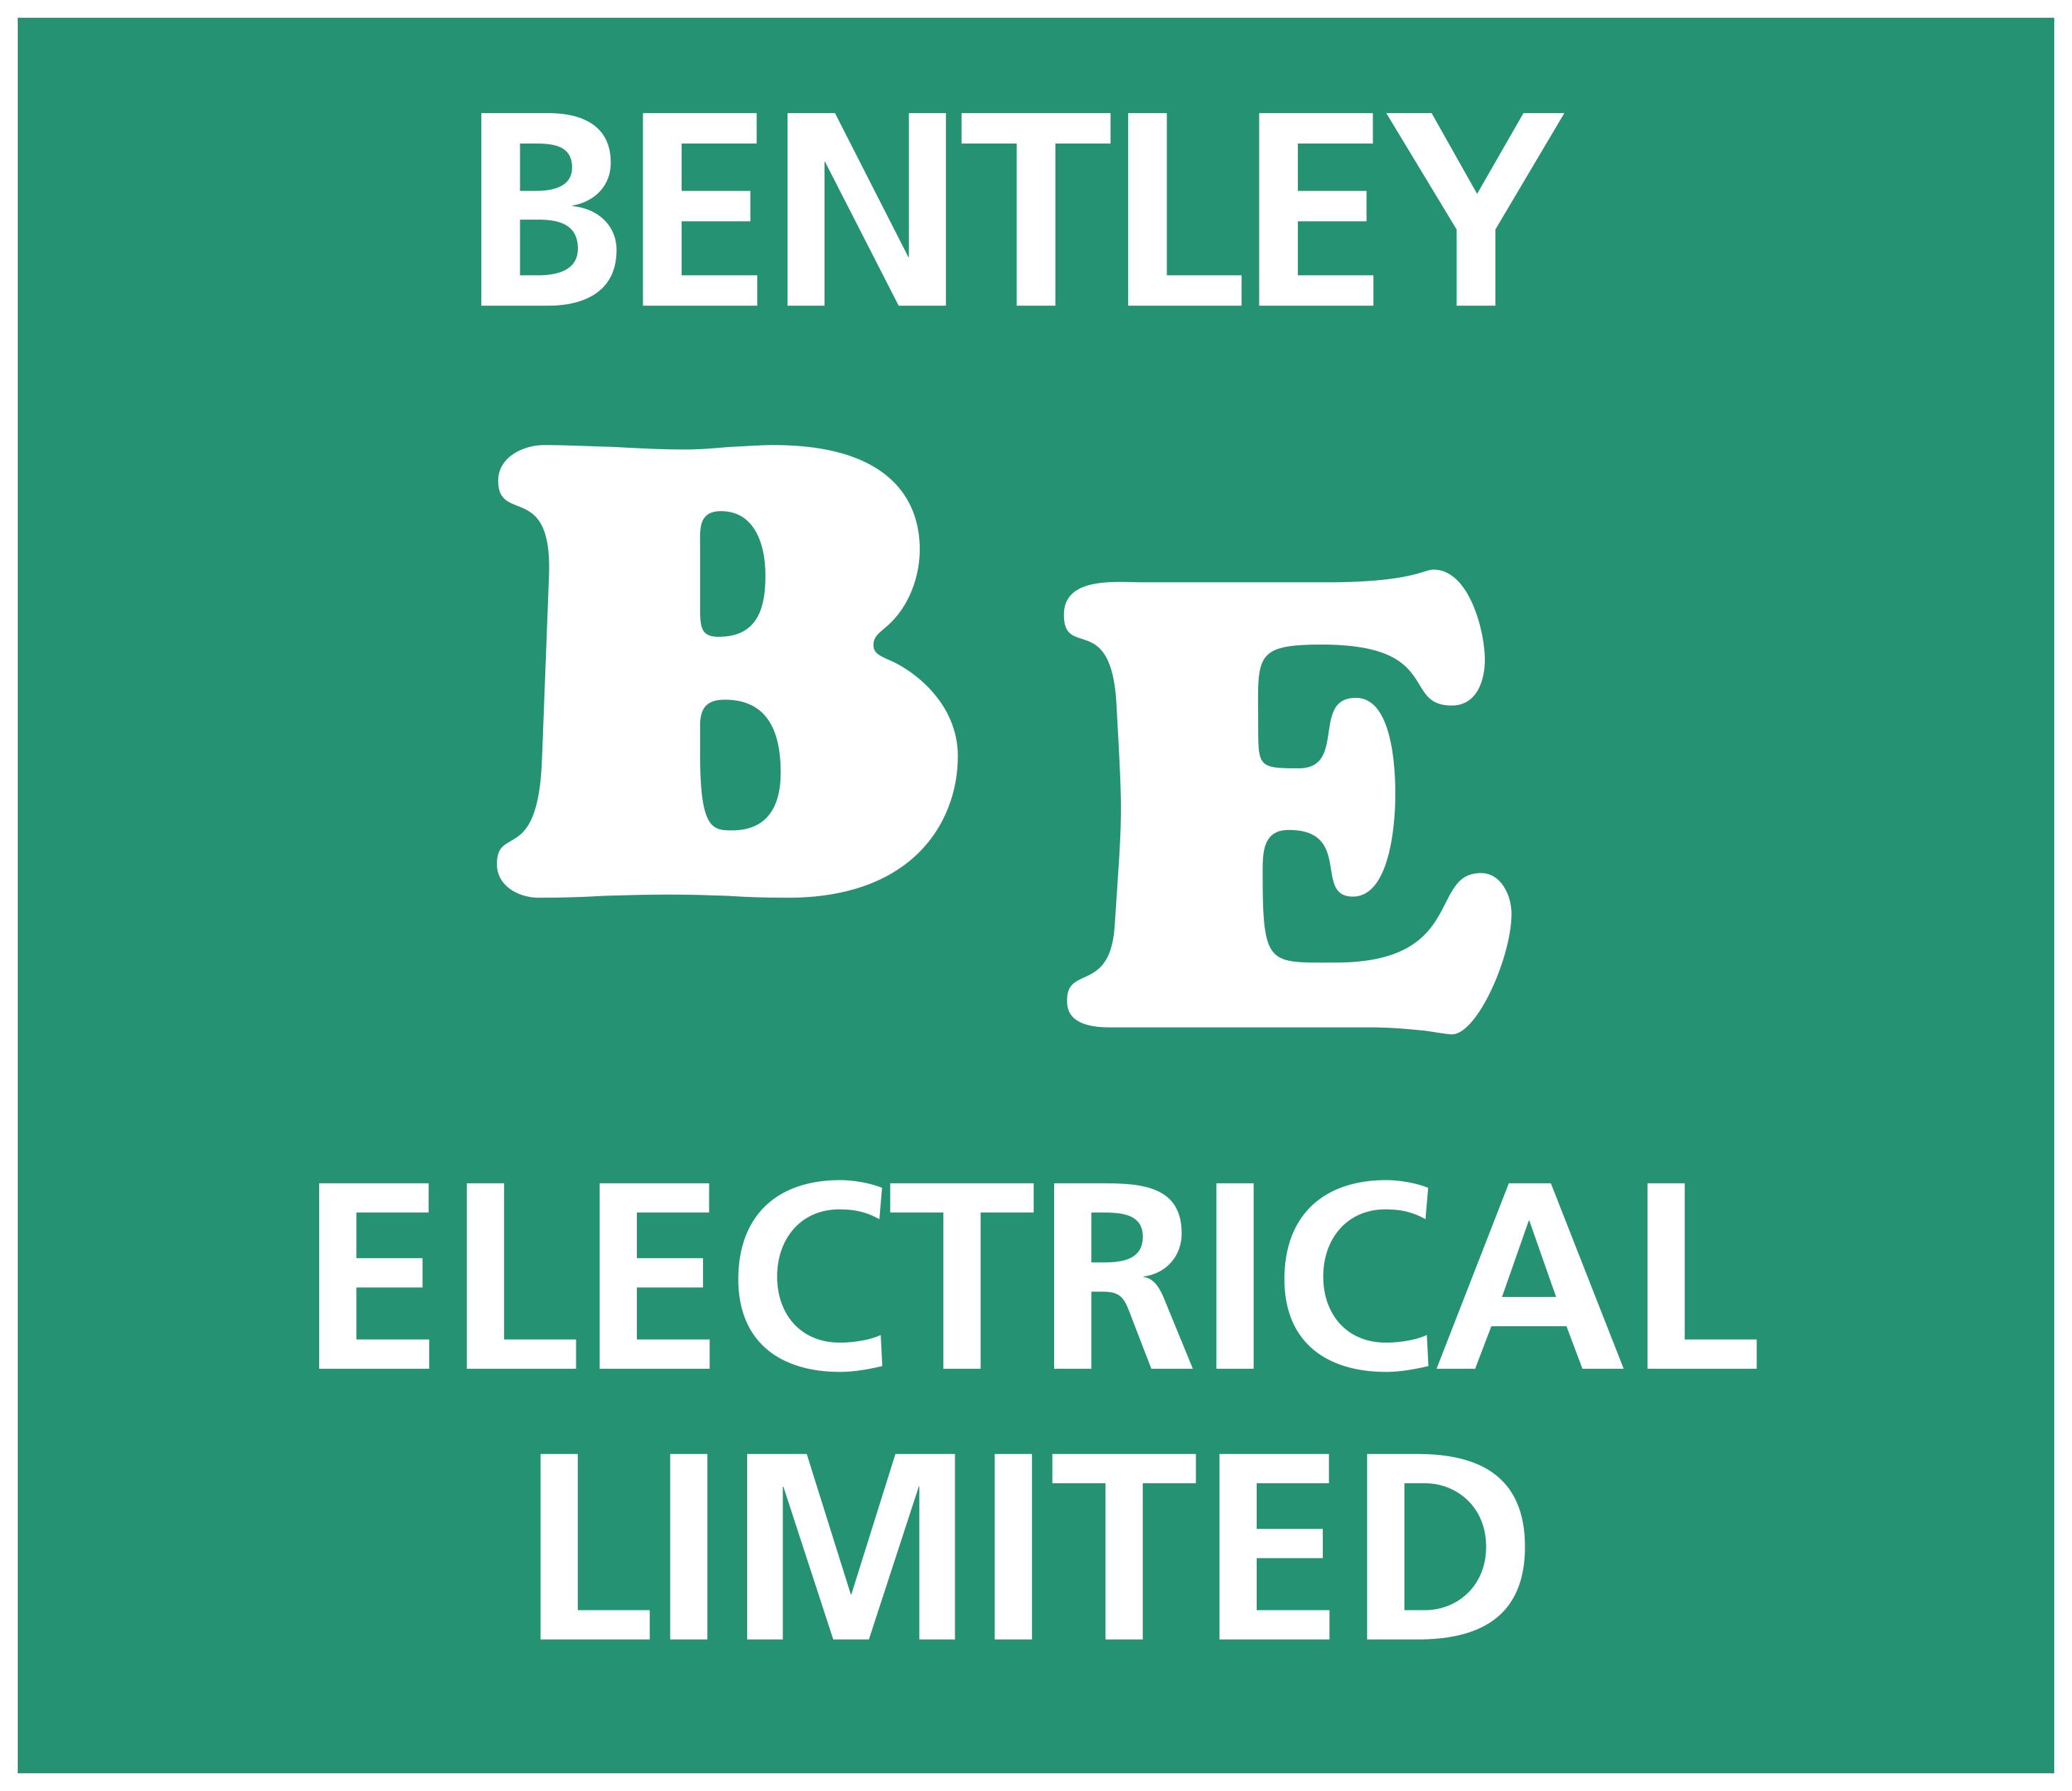 Bentley Electrical